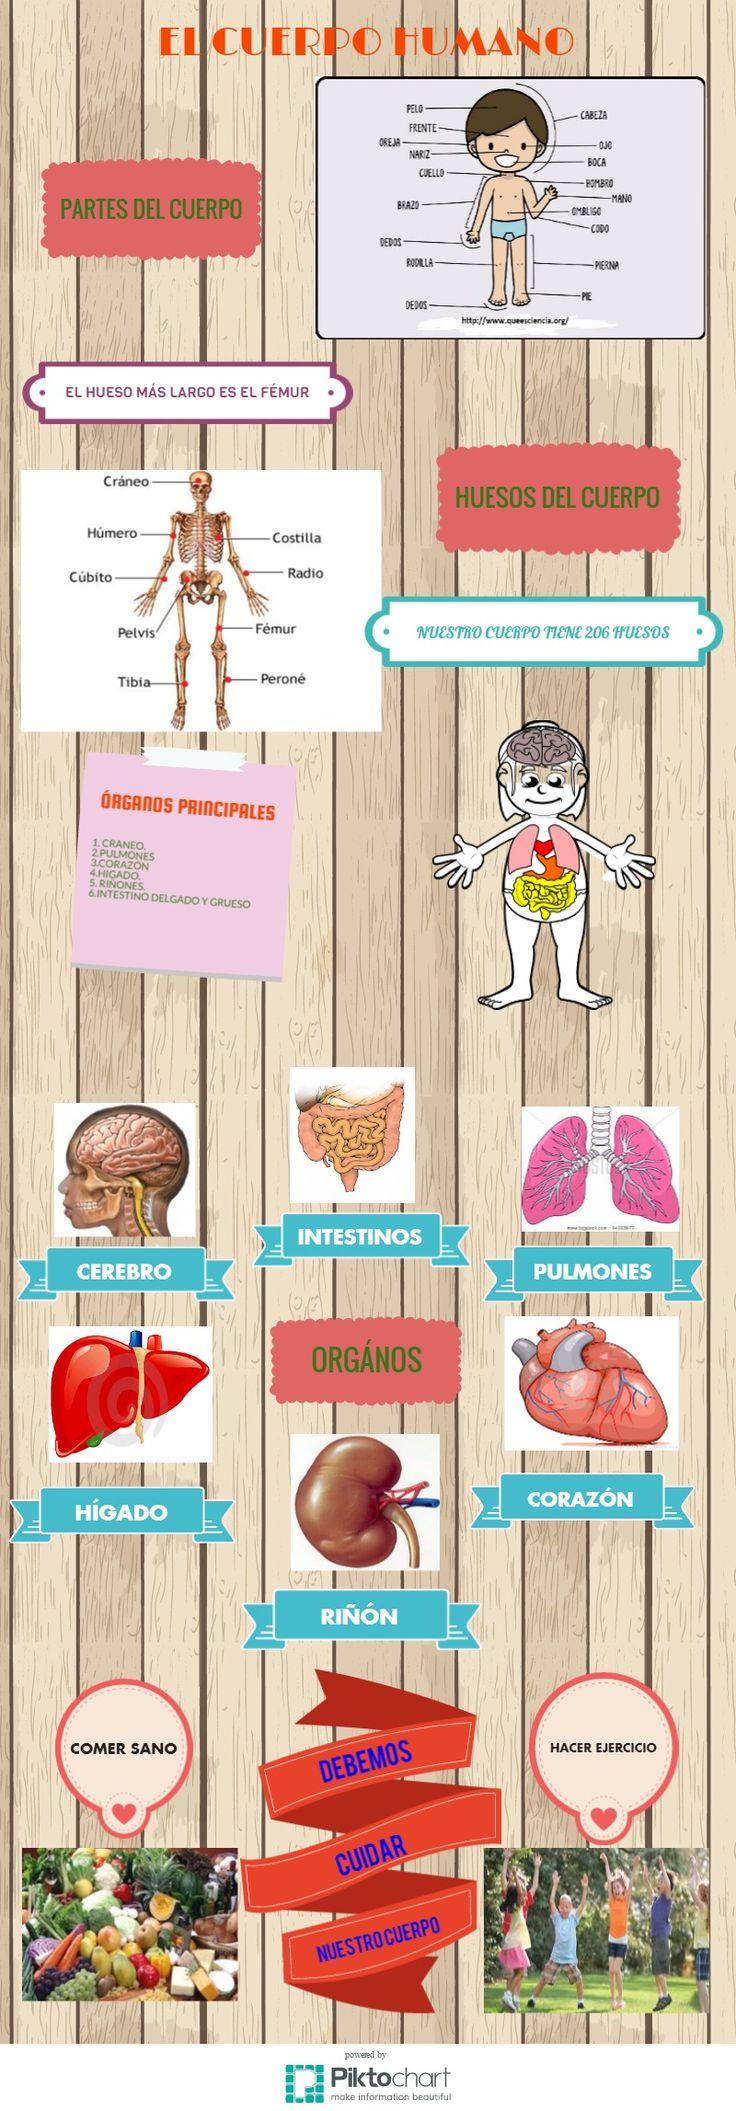 infografia el cuerpo humano | Piktochart Infographic Editor